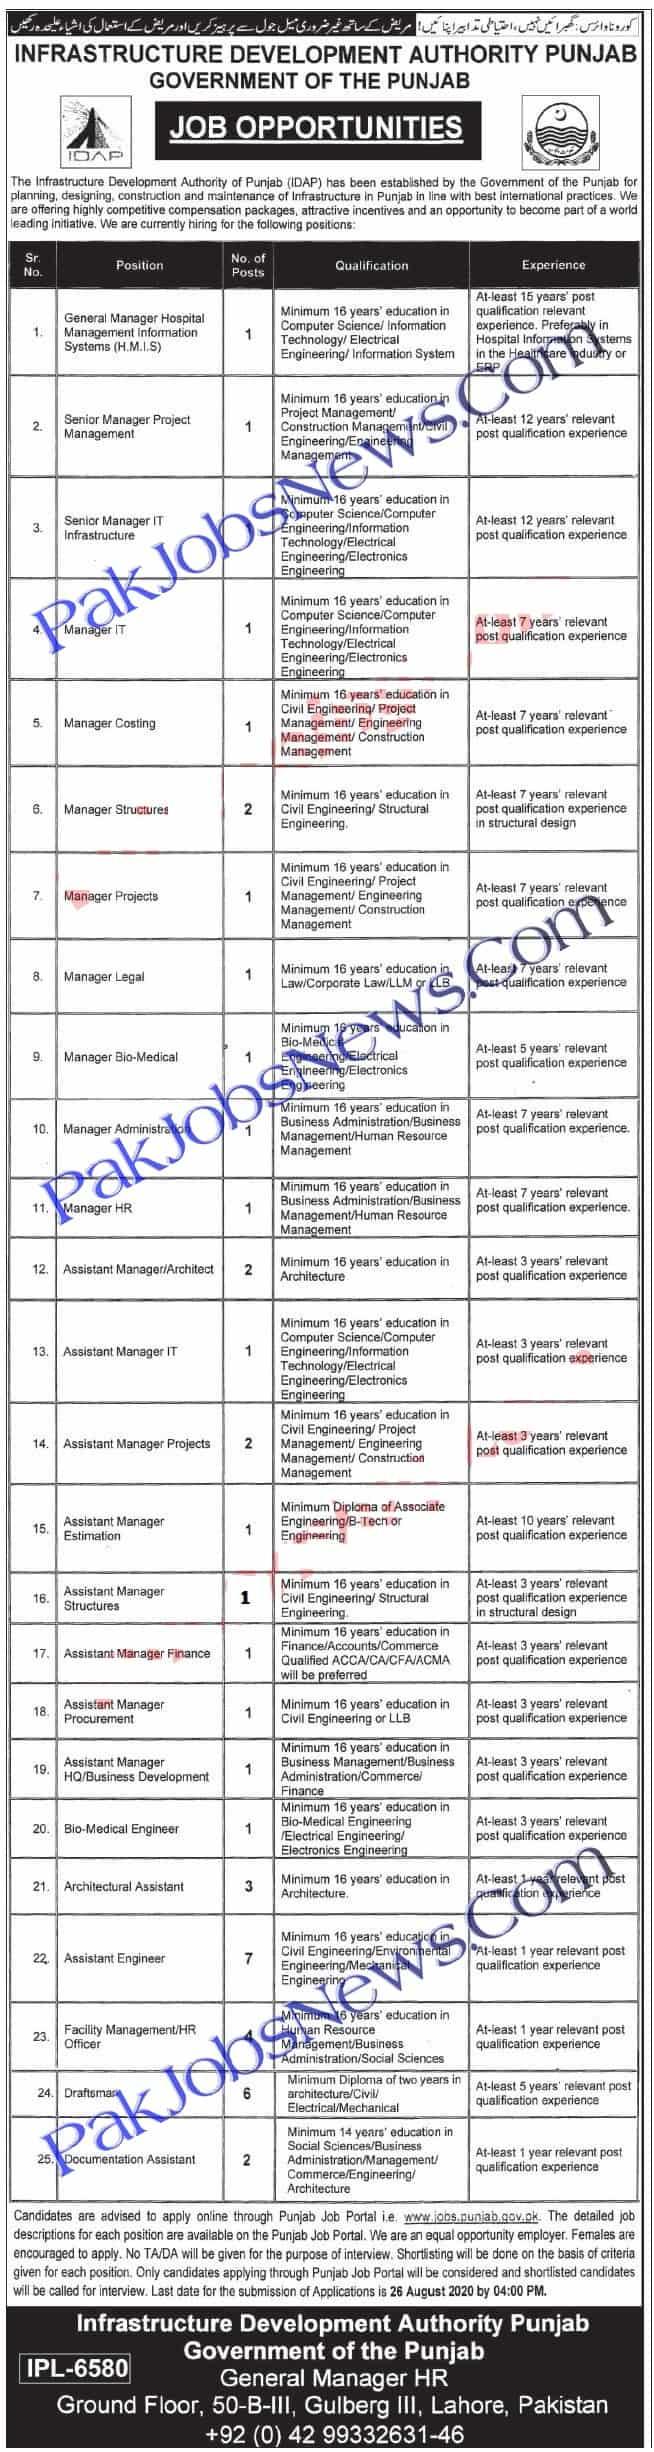 new Infrastructure Development Authority Punjab IDAP Jobs 2020 Advertisement